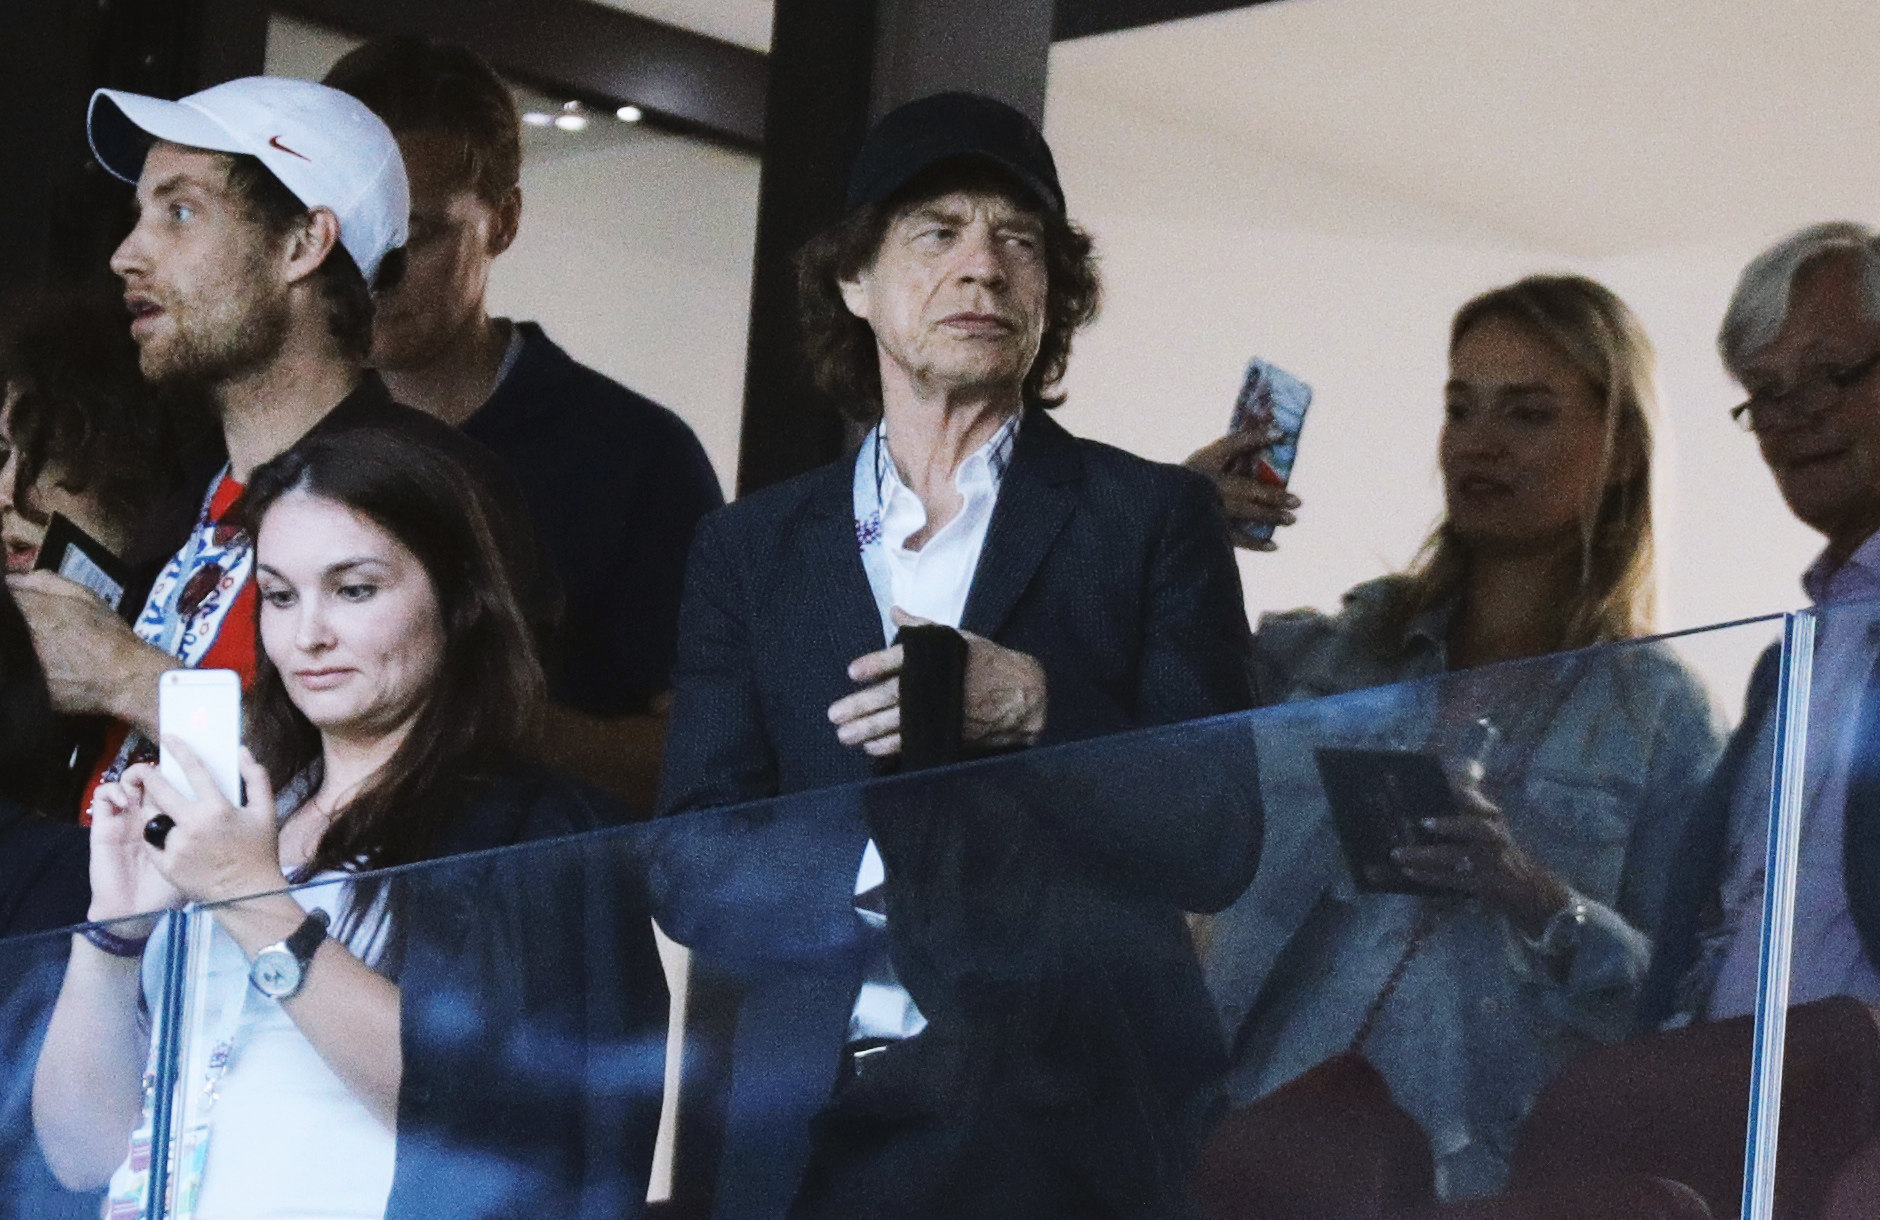 Мик Джаггер, вокалист The Rolling Stones